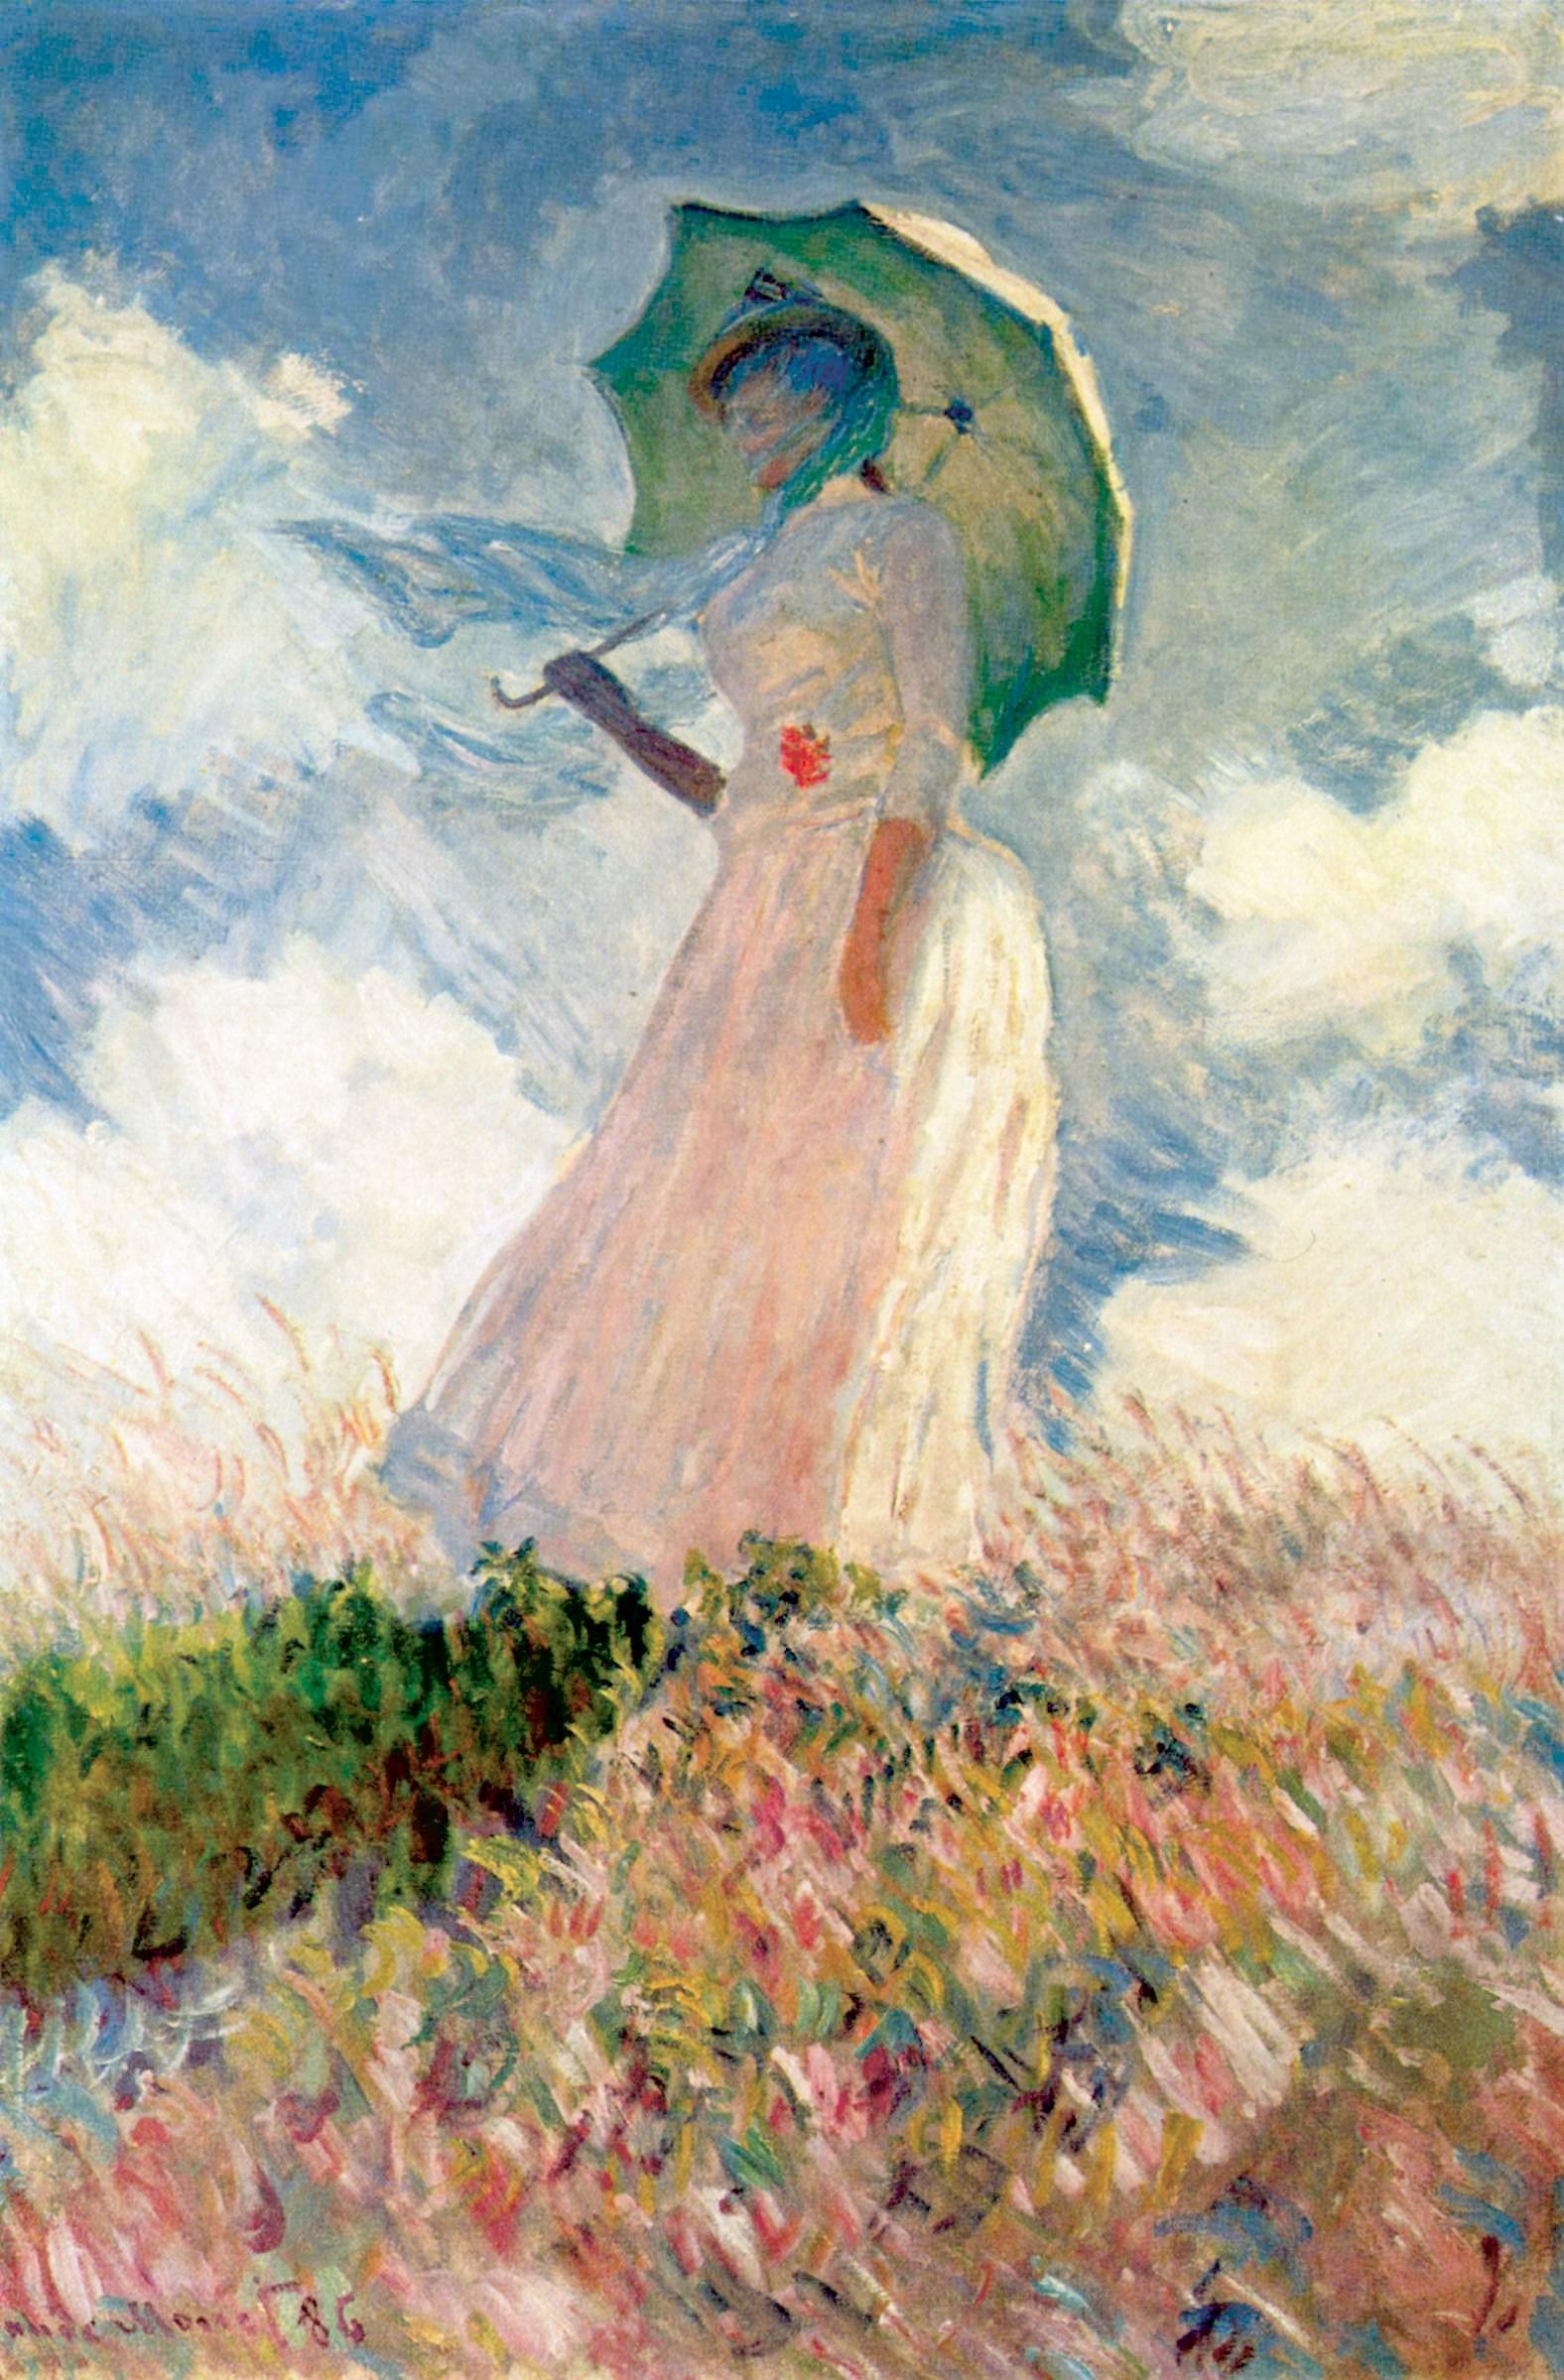 किस की नवाज़िश हुई रूखी सी ज़िन्दगी पर, हल्की की बारिश हुई सूखी सी ज़िन्दगी पर... .......तुषार गुप्ता 'My beloved wife Suzanne', 1886 Painting by Claude Monet, French, 1840 - 1926